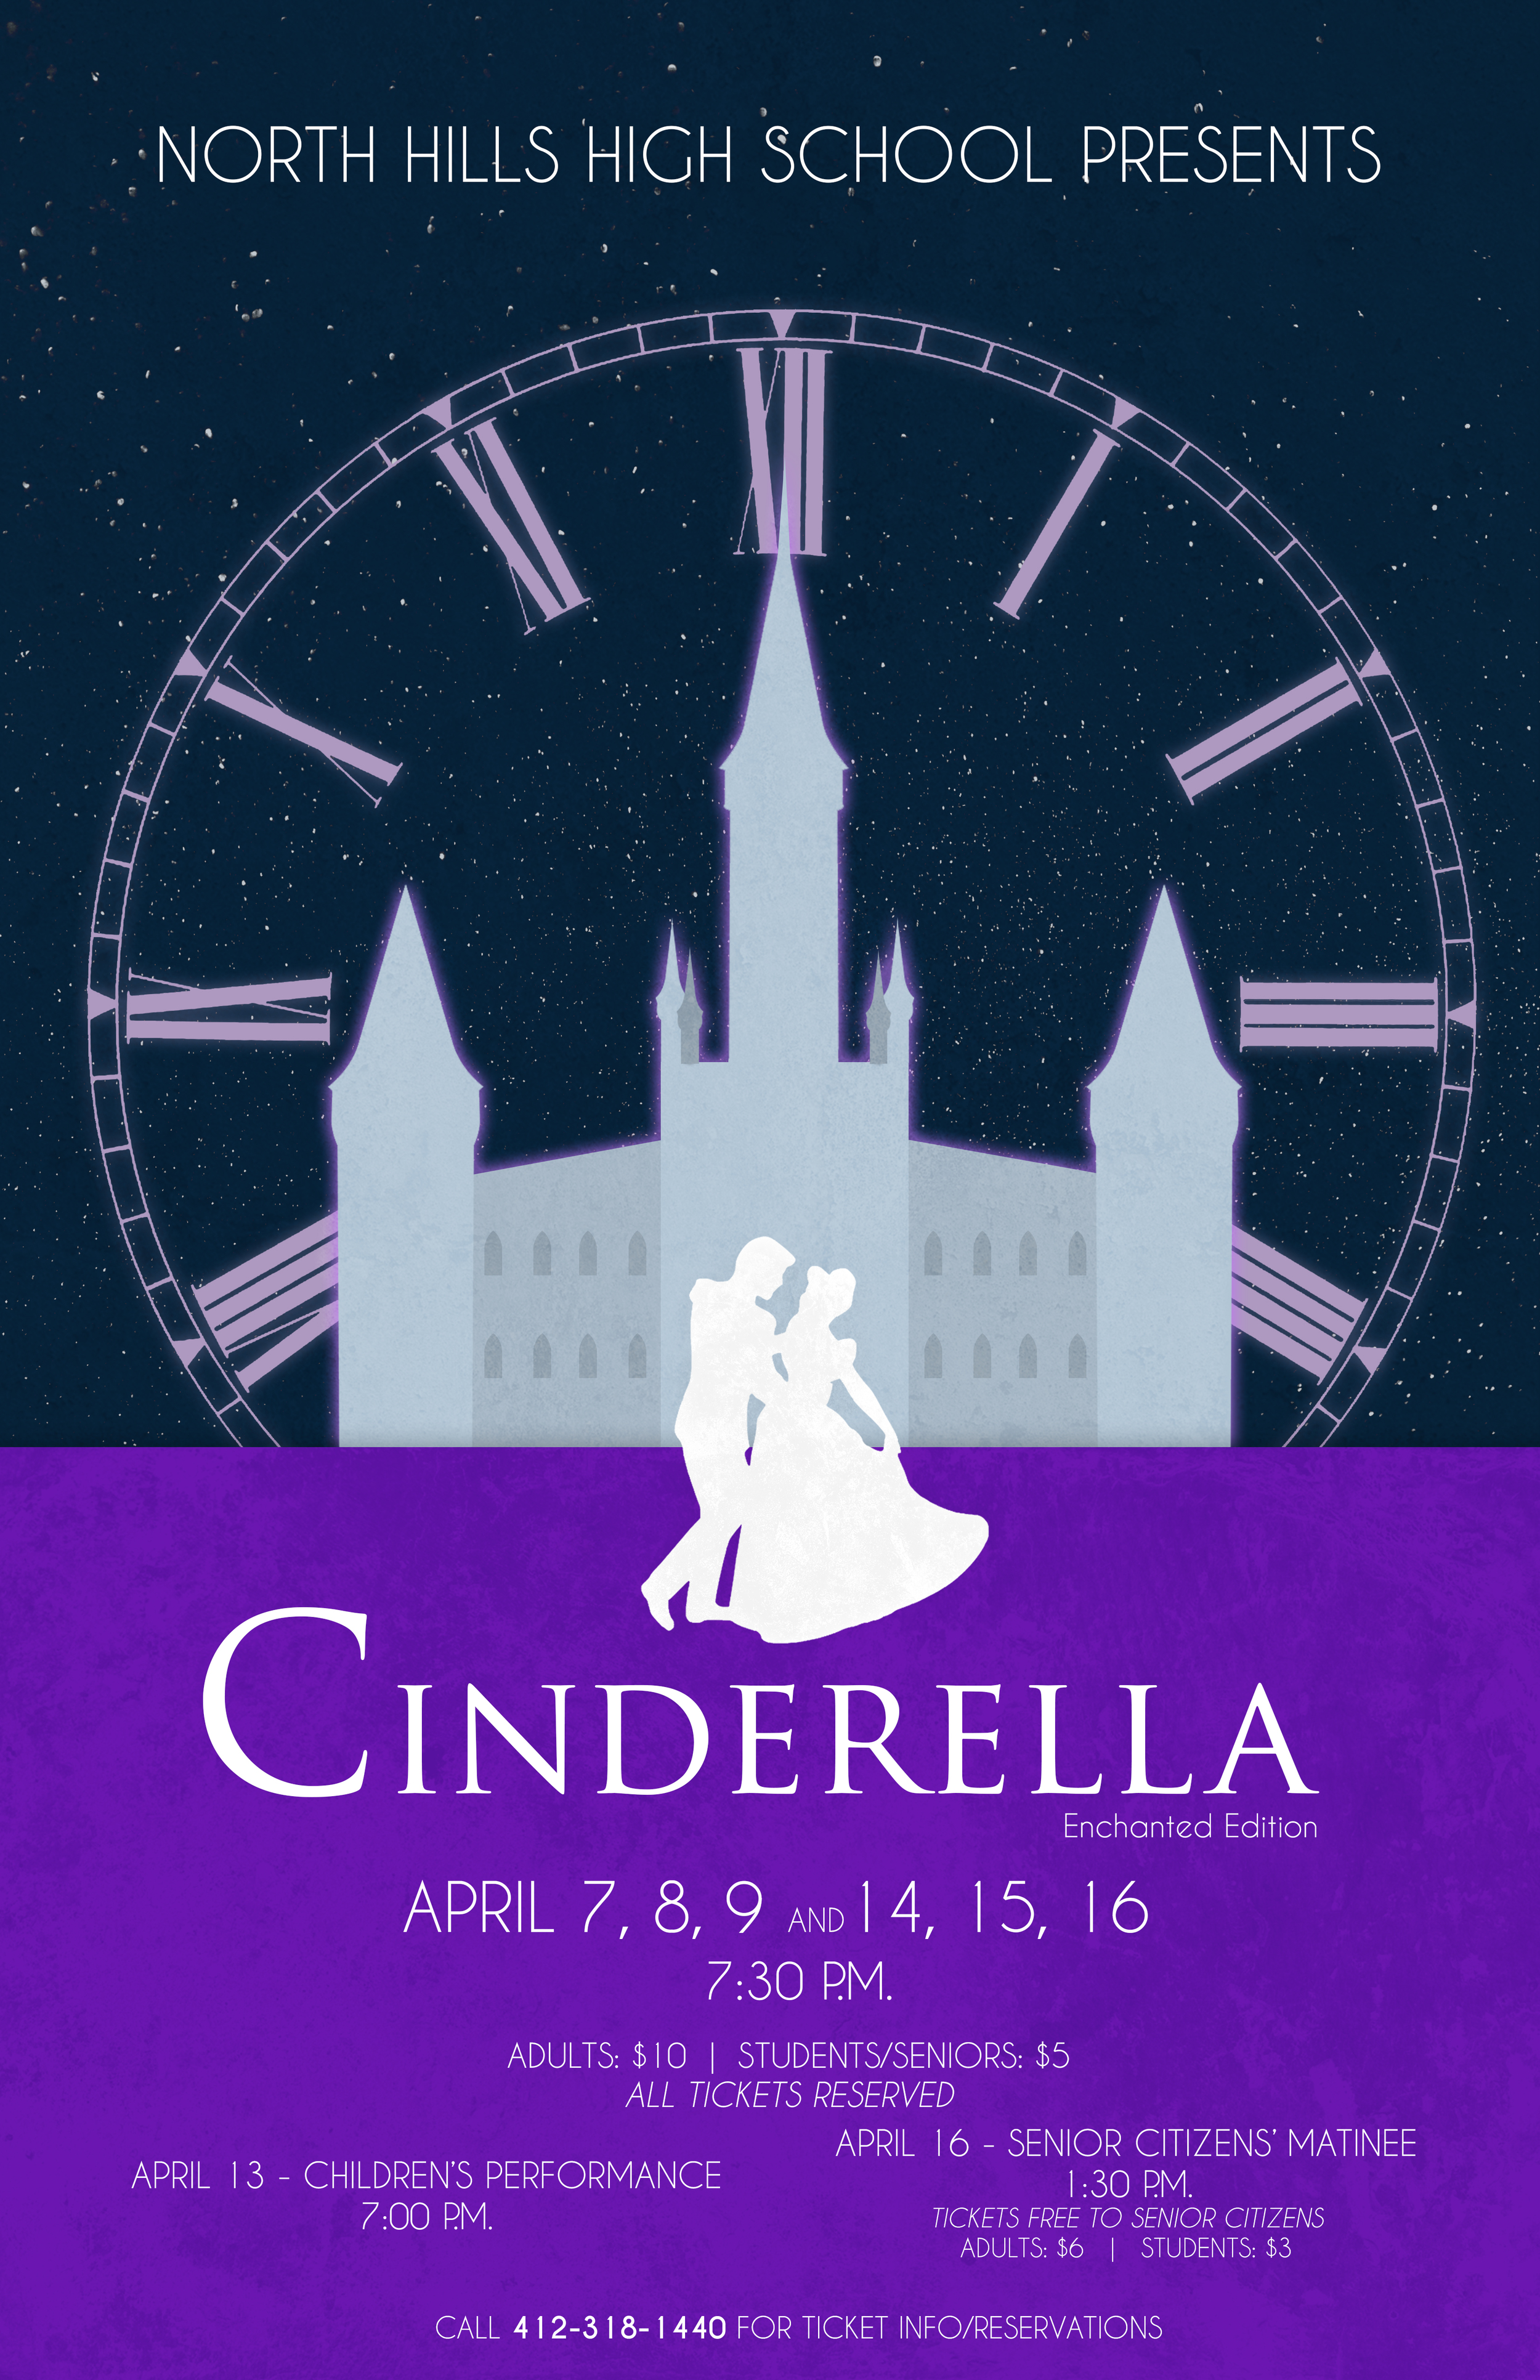 CinderellaPoster11x17.jpg